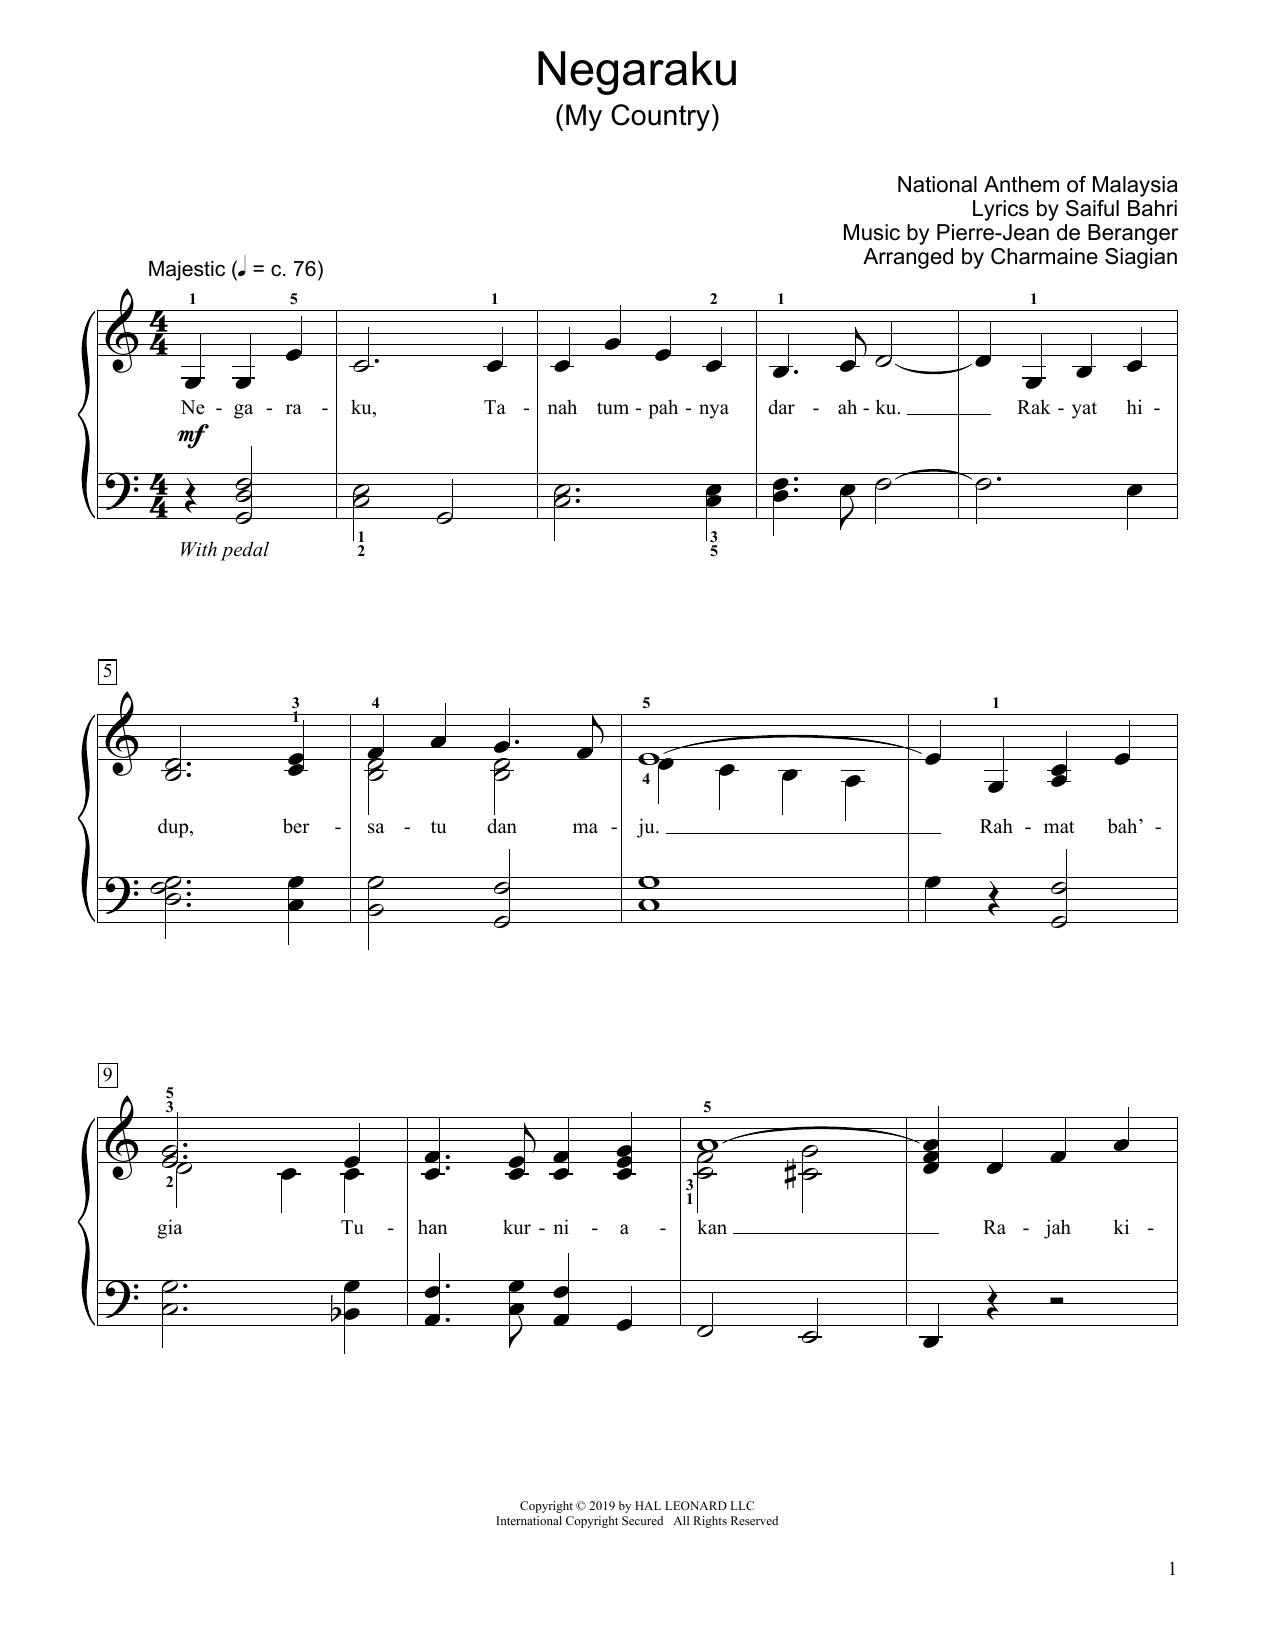 Saiful Bahri My Country (Negaraku) (arr. Charmaine Siagian) sheet music notes and chords. Download Printable PDF.